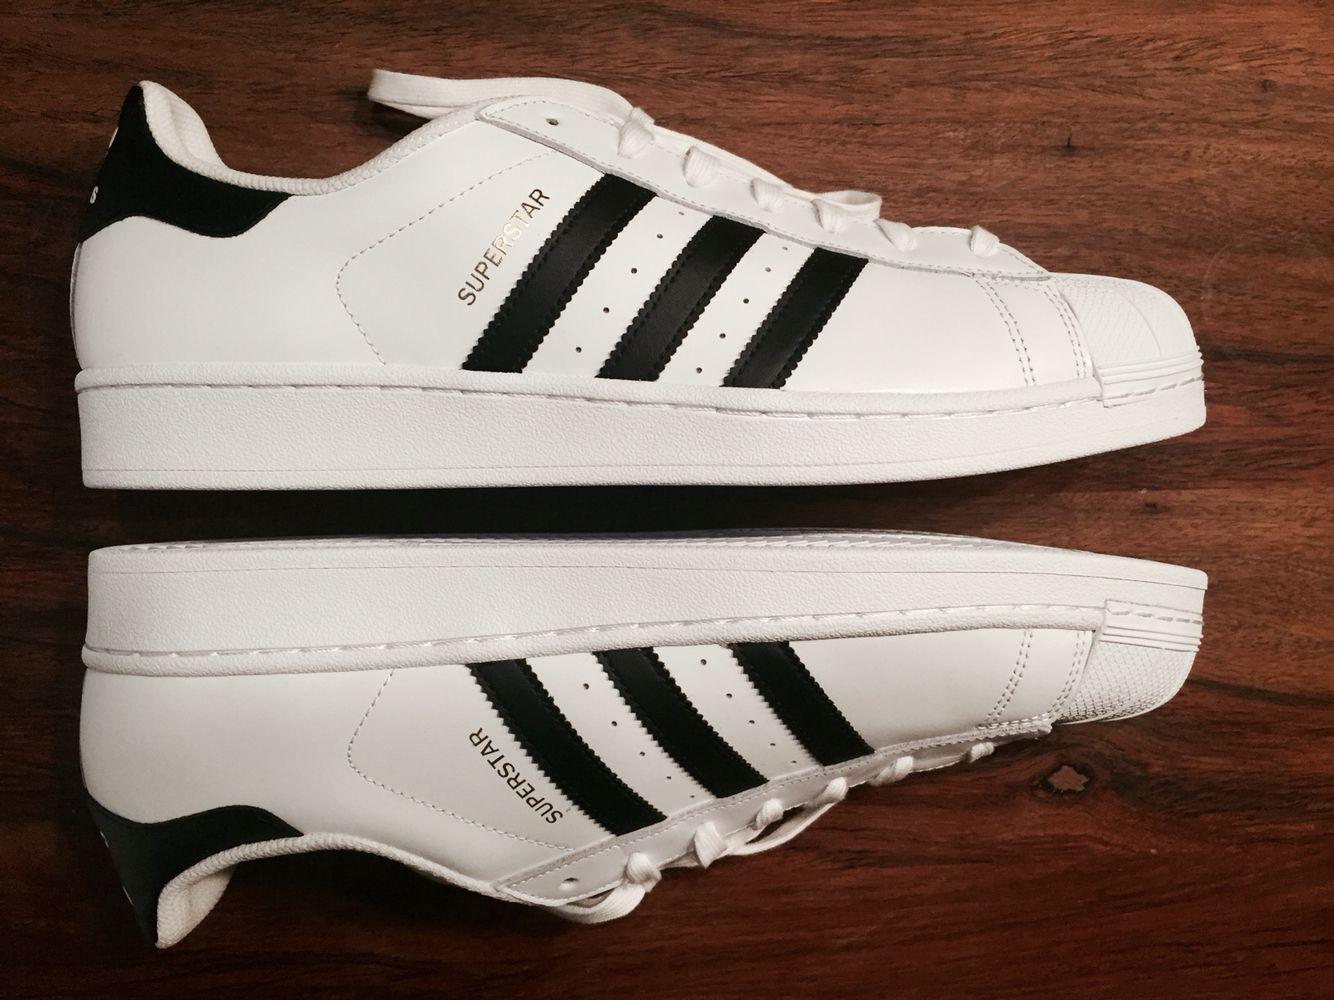 Adidas #Superstar white and black #yeah #oldschool